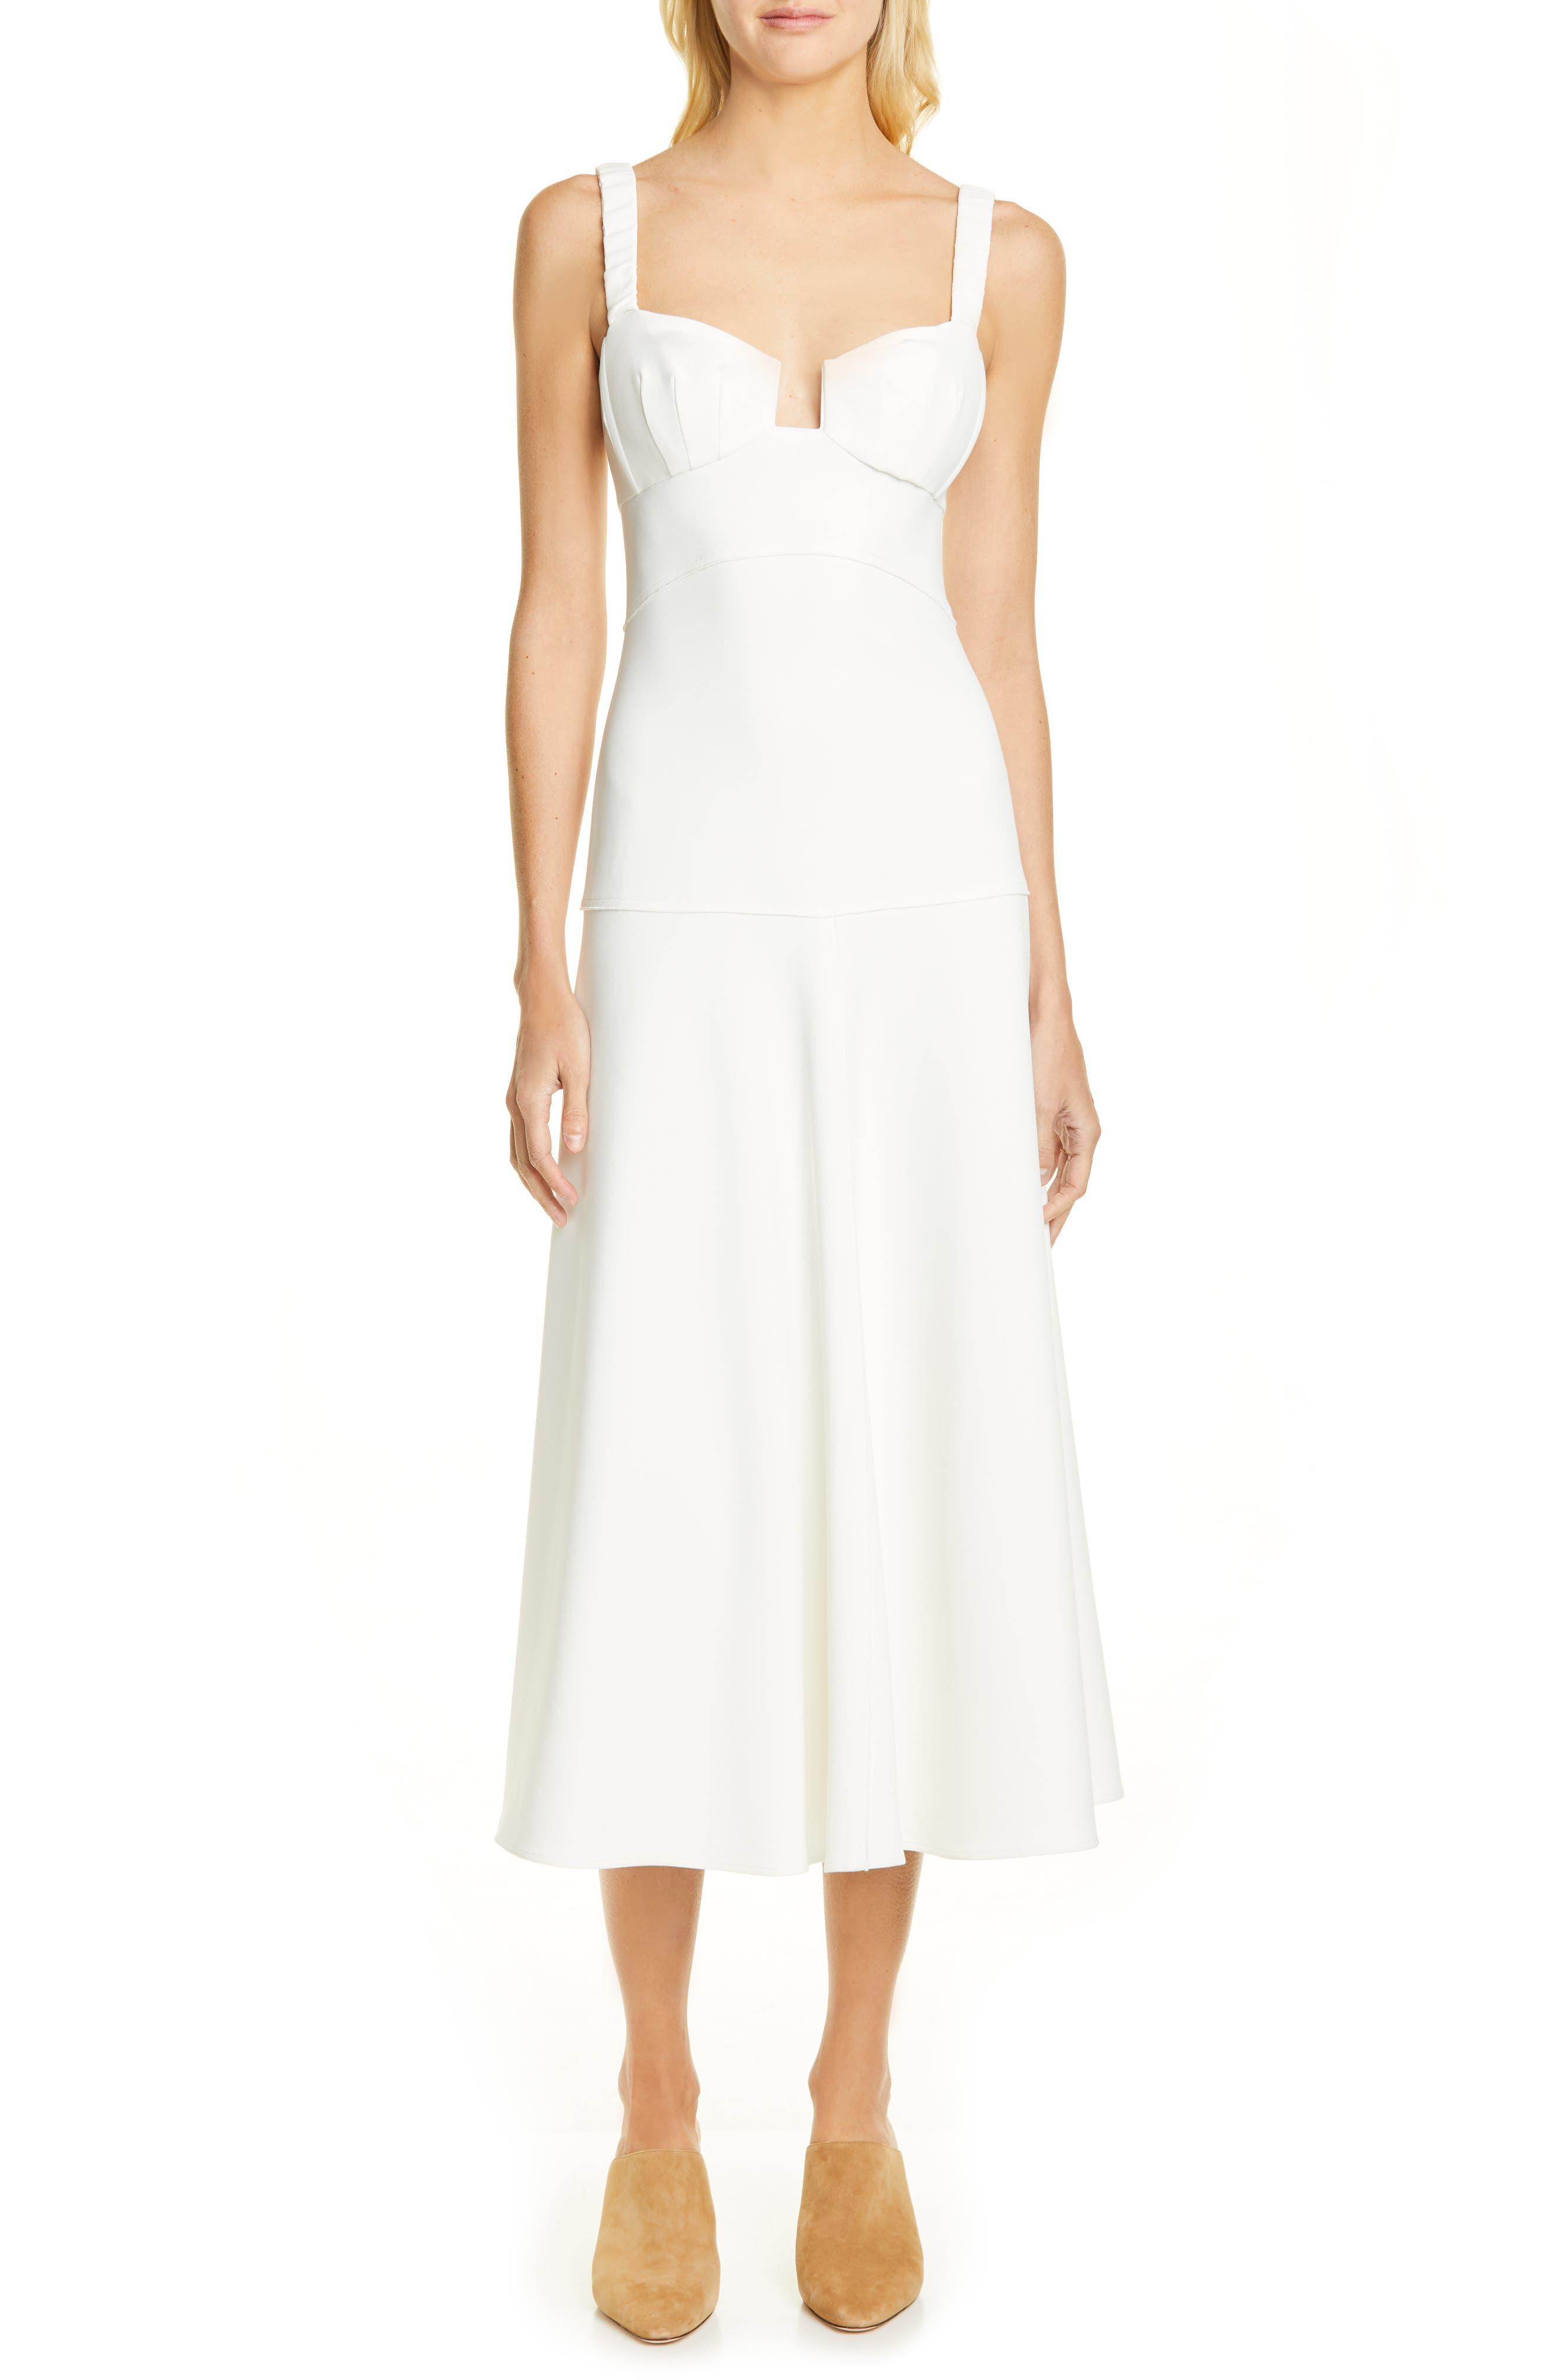 Rachel Comey Spike Bustier Midi Dress, Ivory